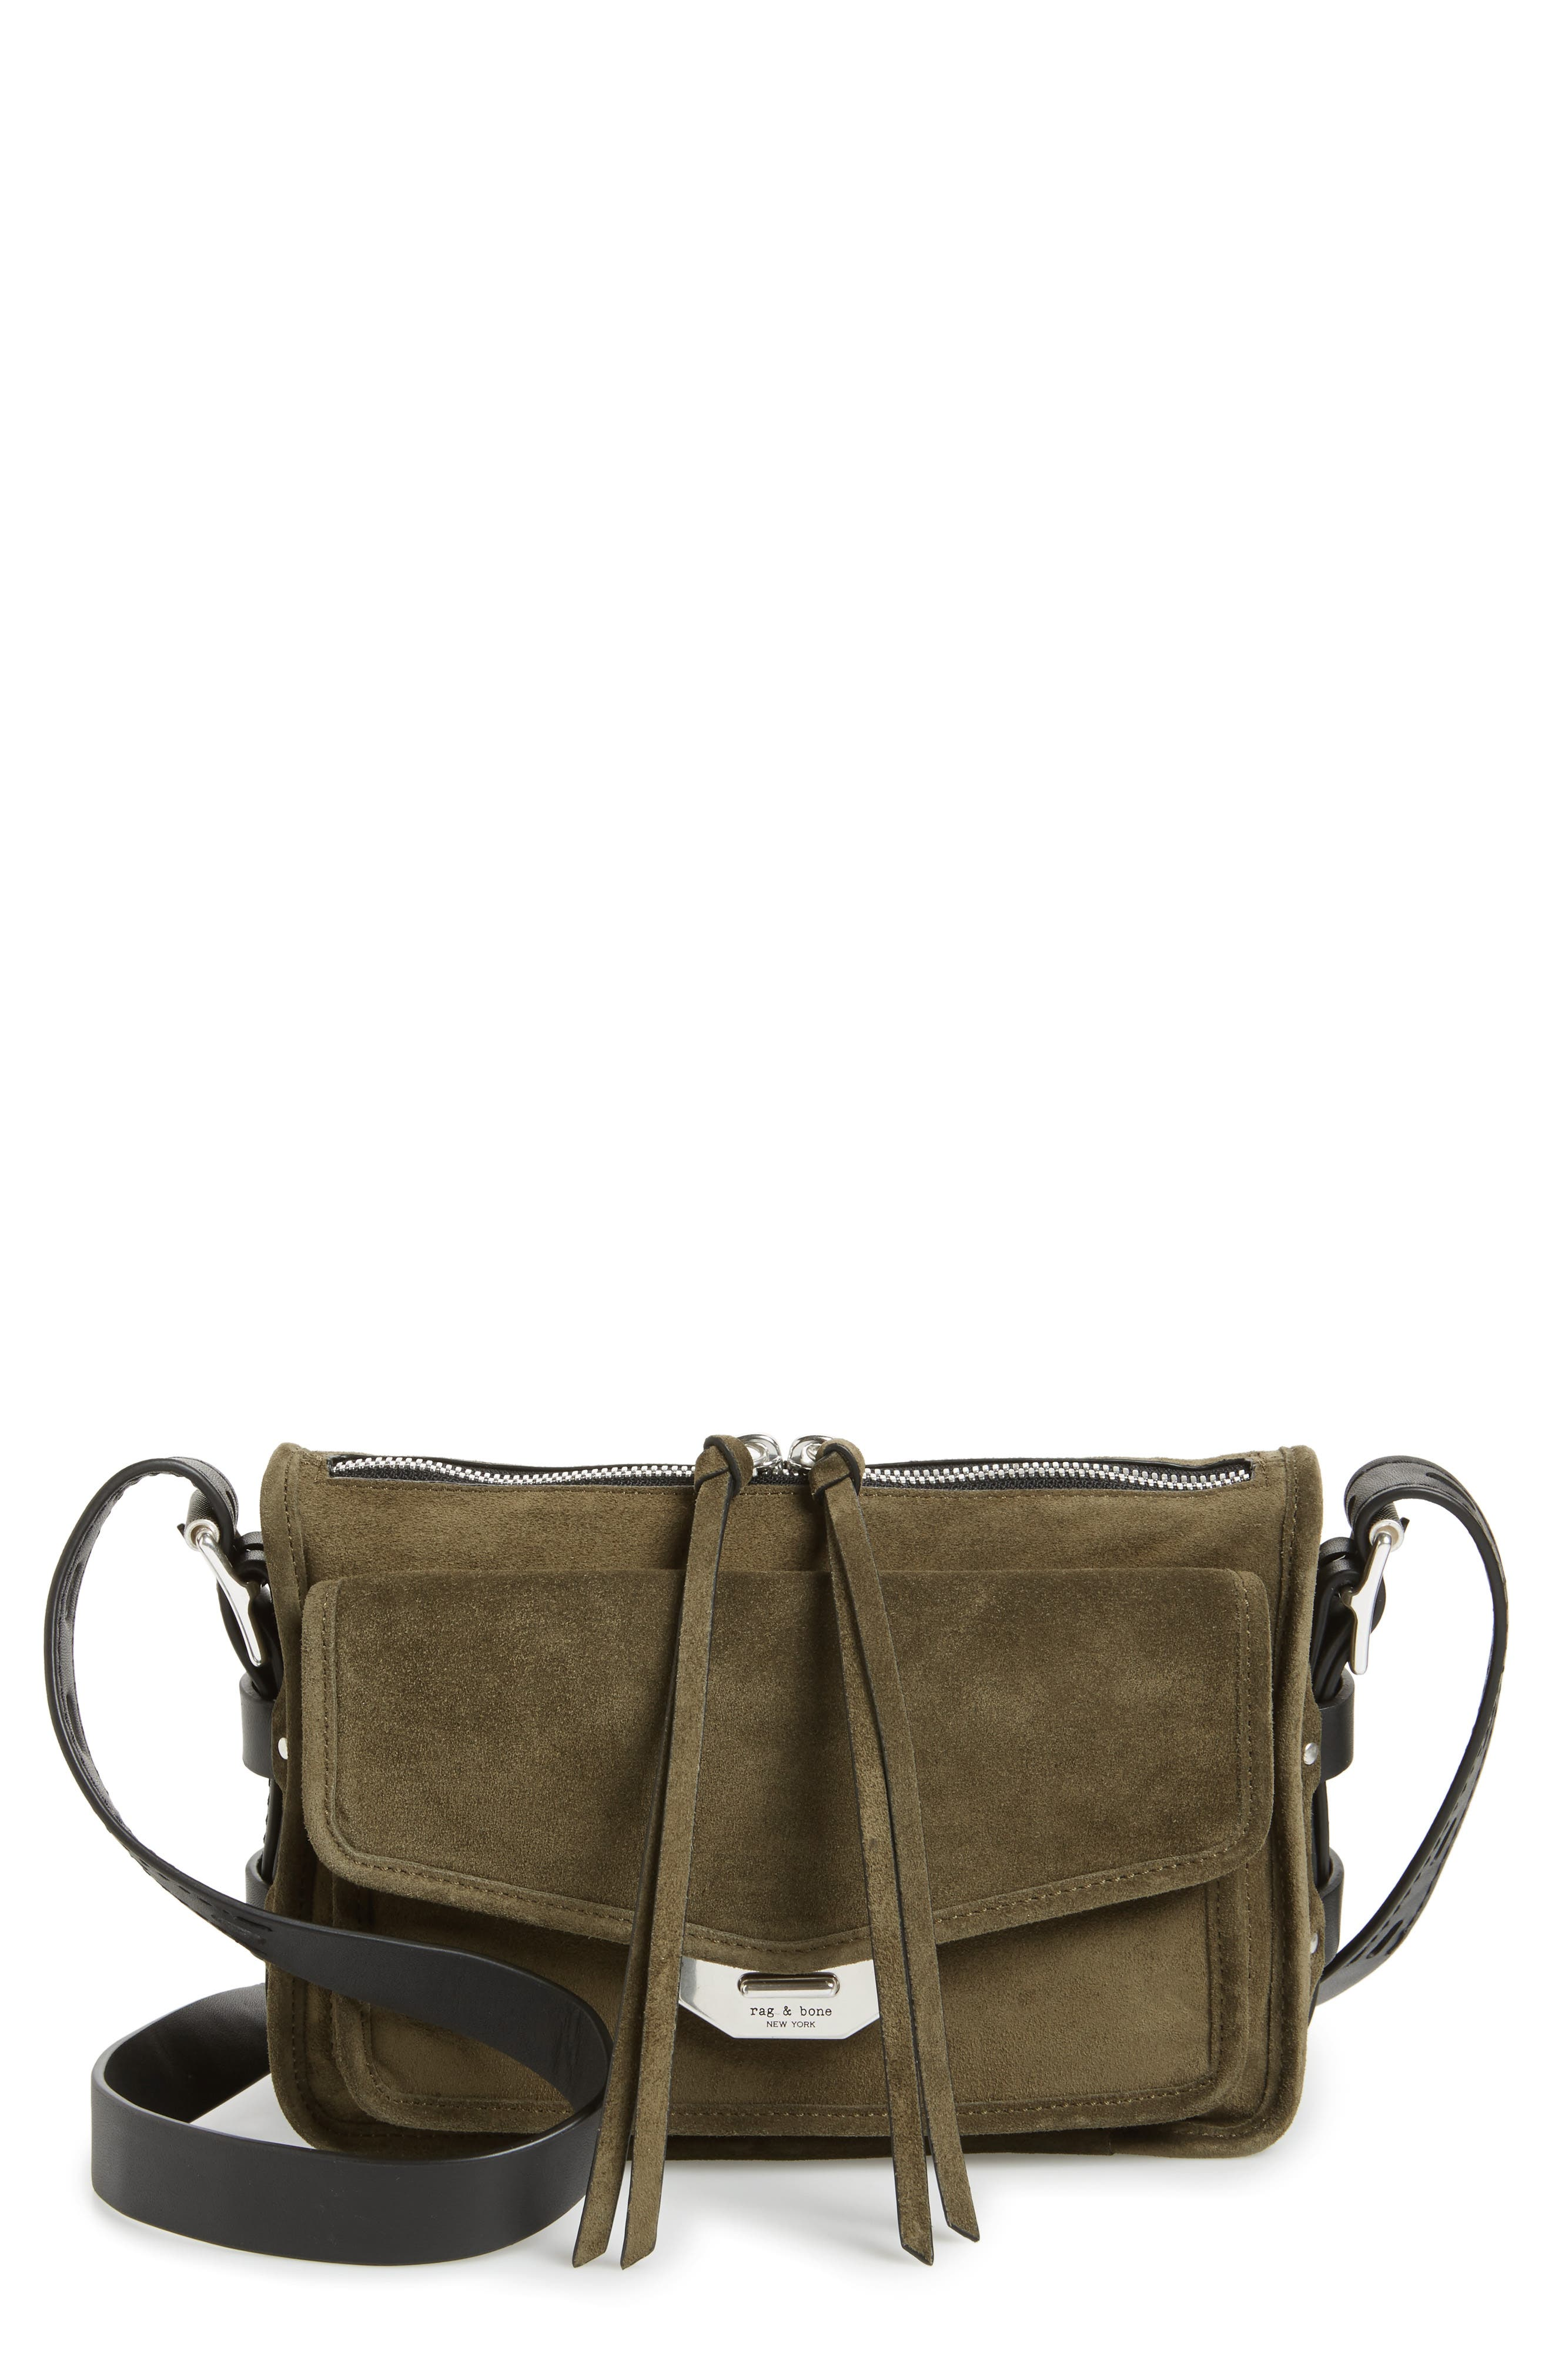 Rag Amp Bone Small Leather Field Messenger Bag Green In